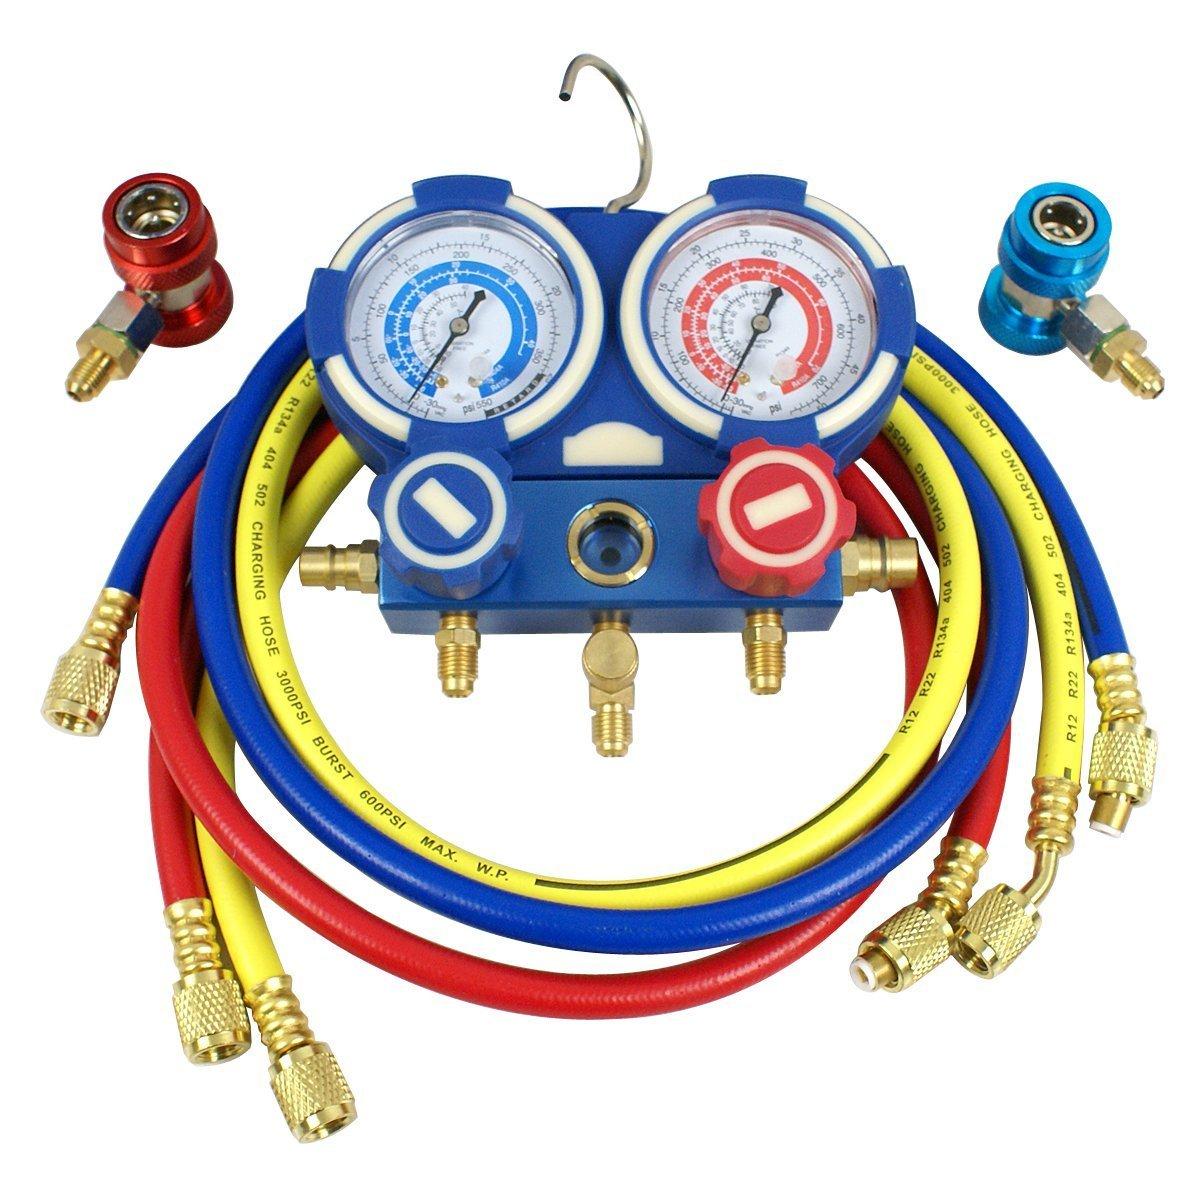 ZENY Combo Air Vacuum Pump HVAC Refrigeration AC Manifold Gauge Set R134a Kit (3.5CFM + Manifold Gauge)